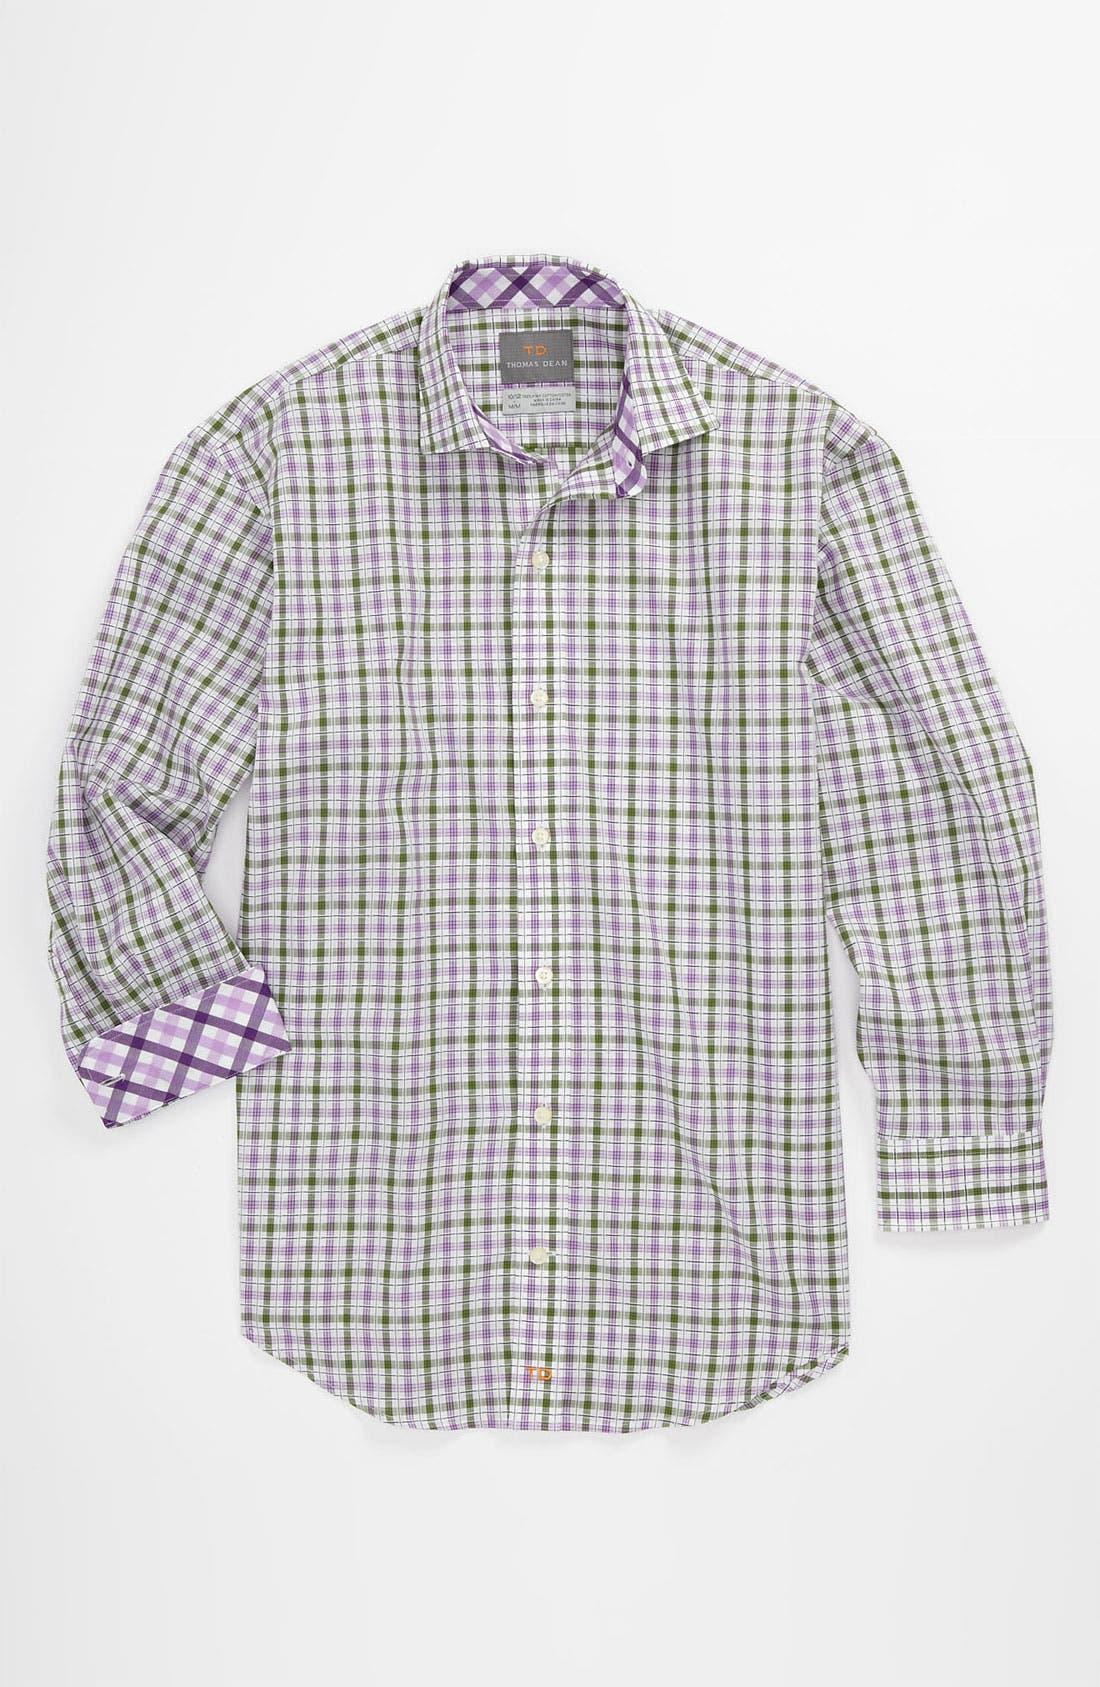 Alternate Image 1 Selected - Thomas Dean Plaid Dress Shirt (Big Boys)